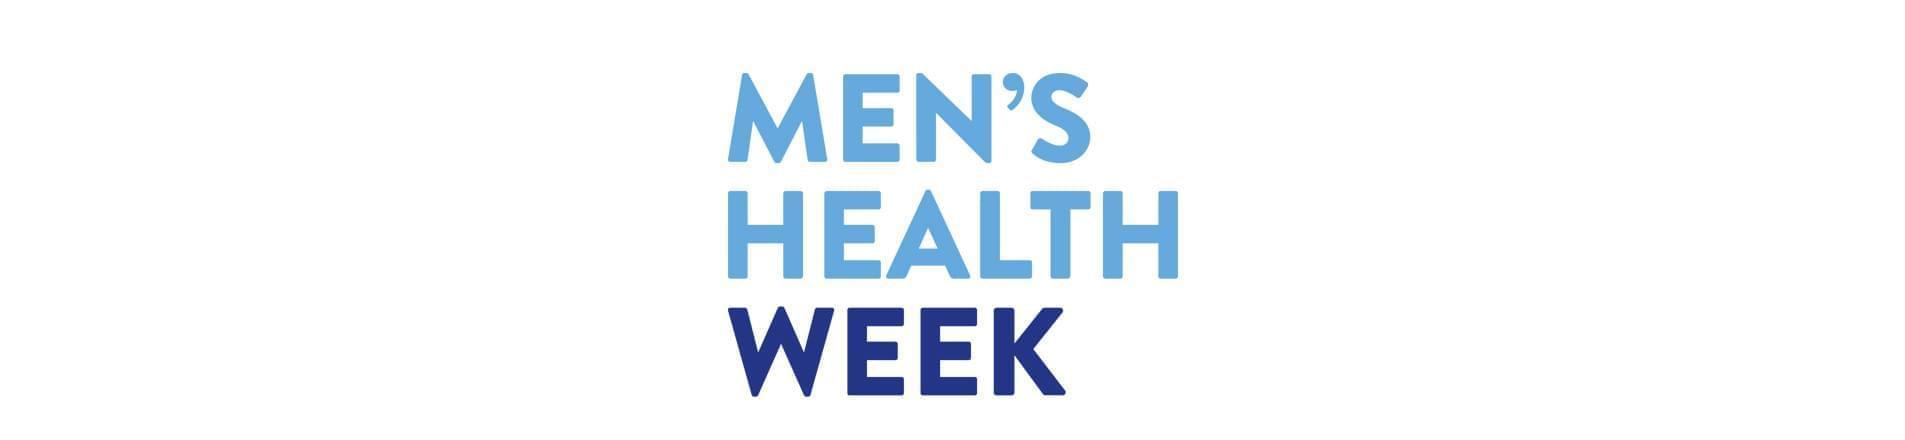 Men's Health Week logo